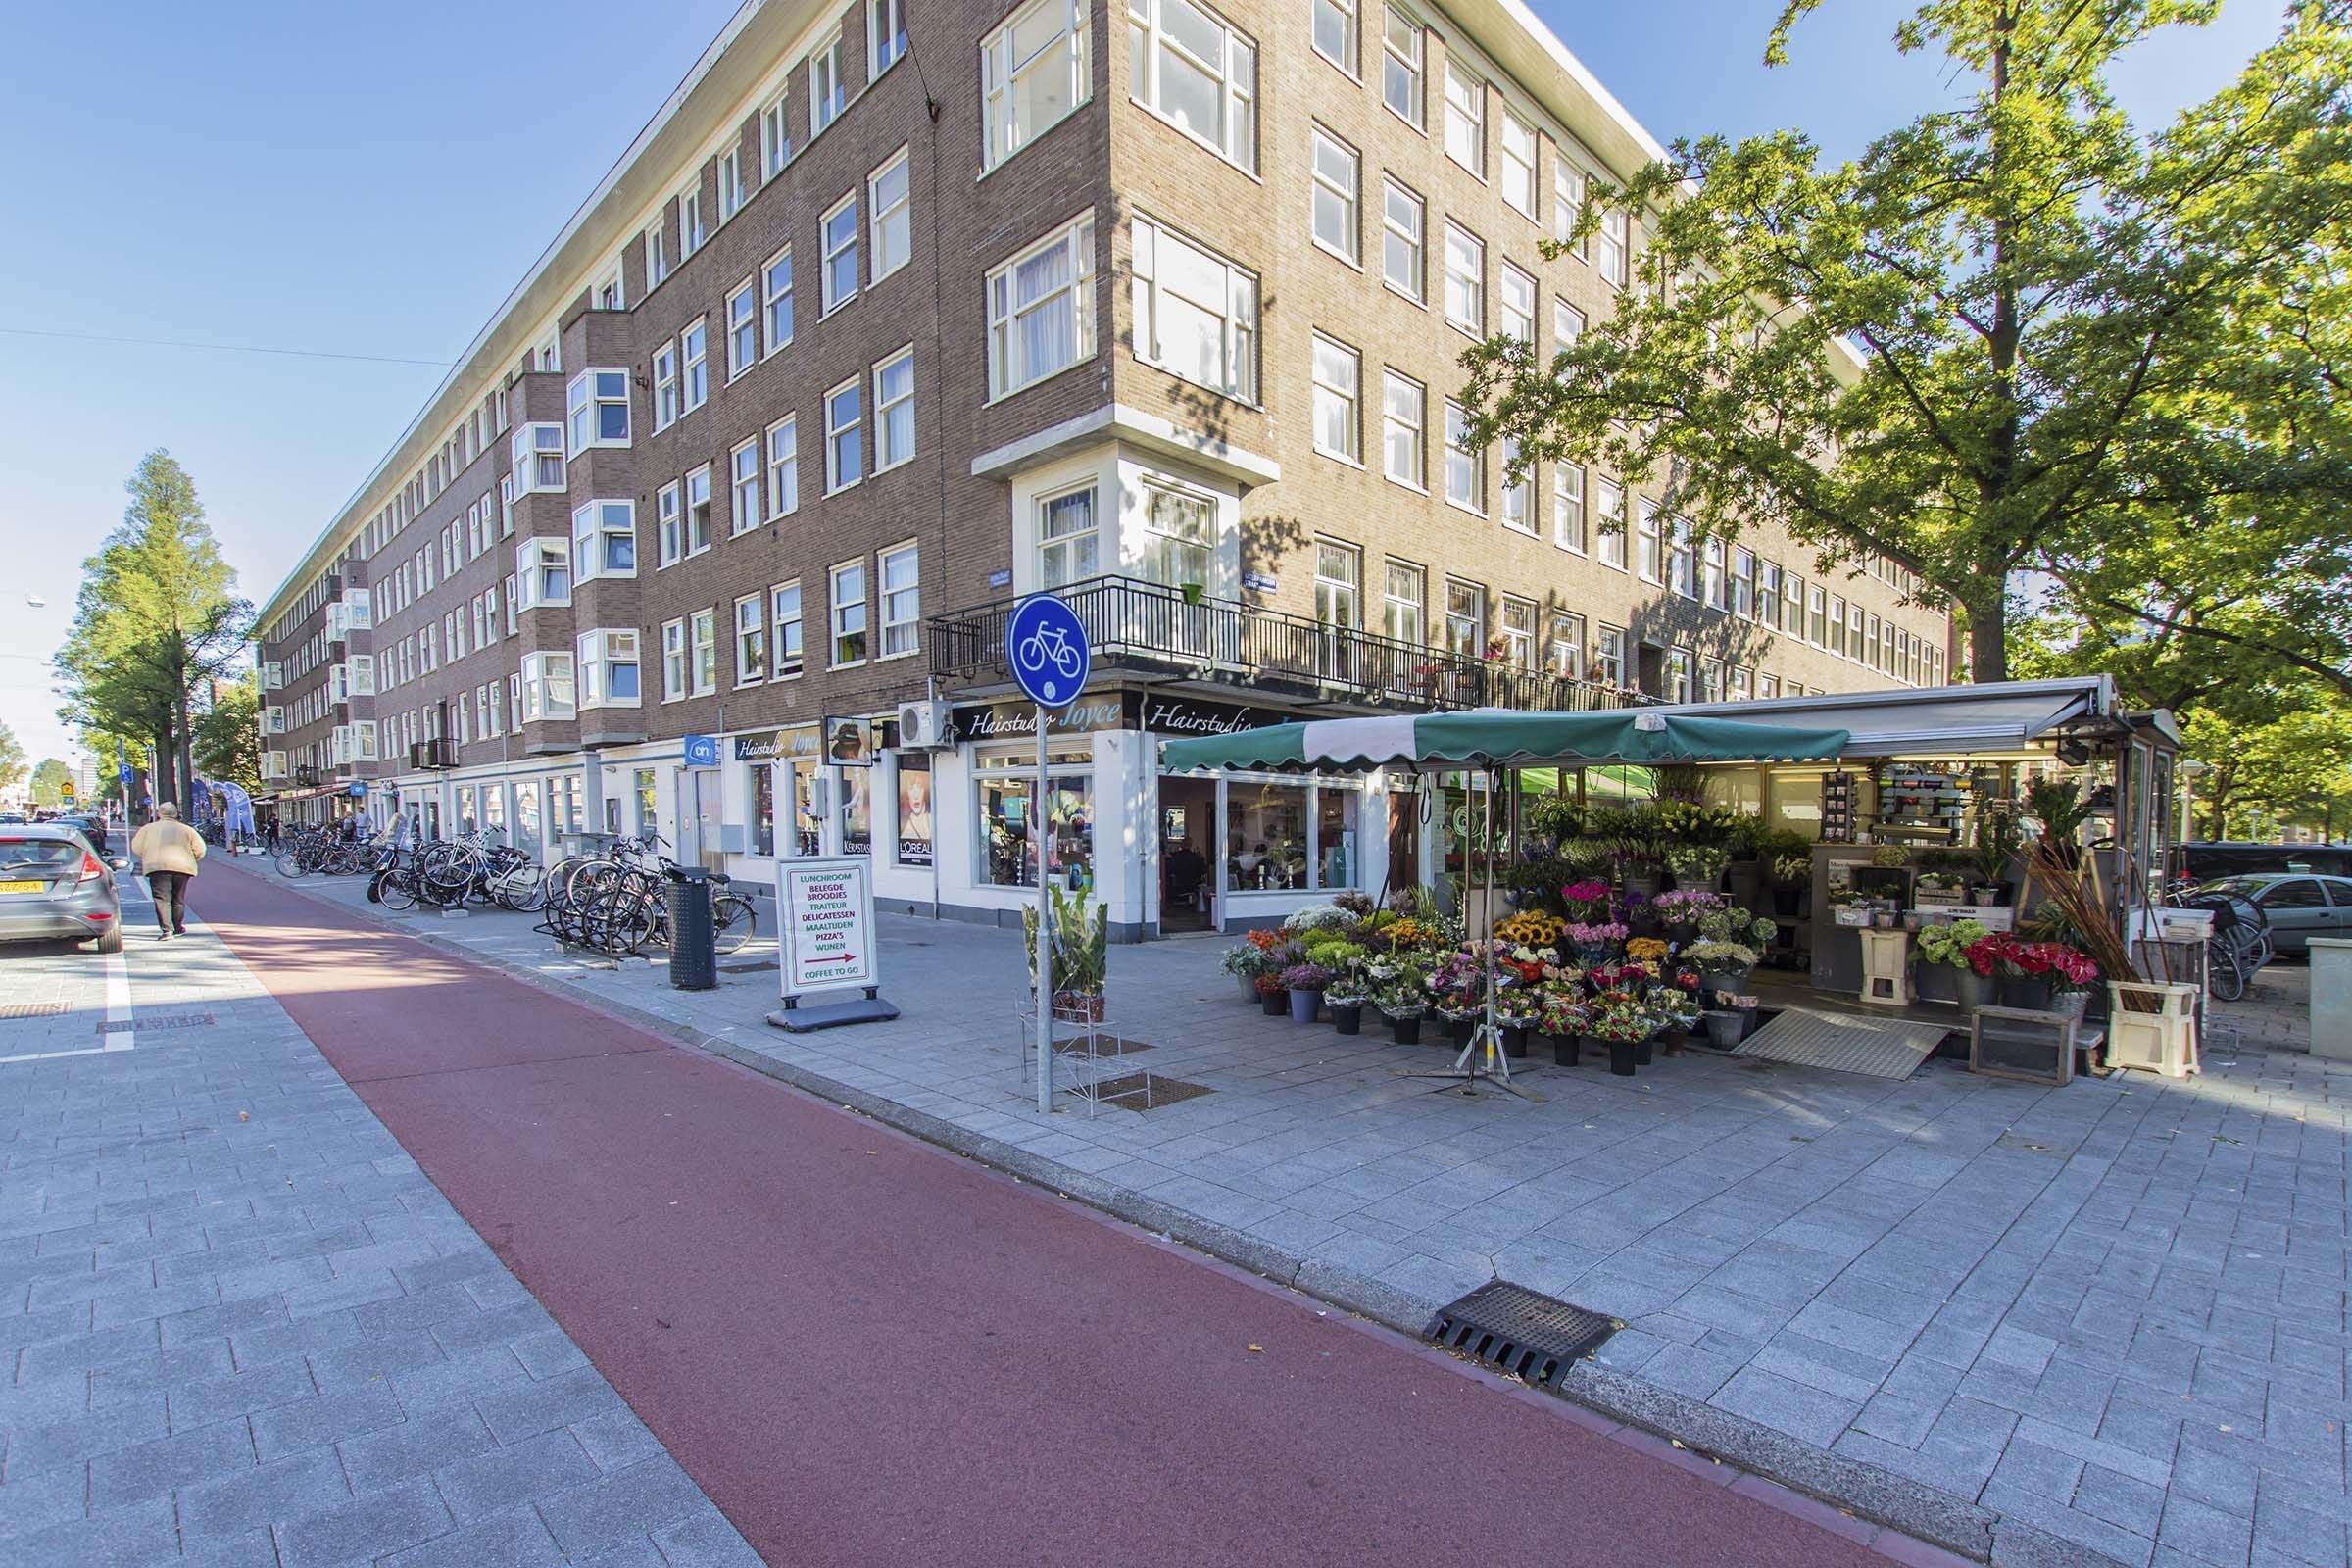 Trompenburgstraat